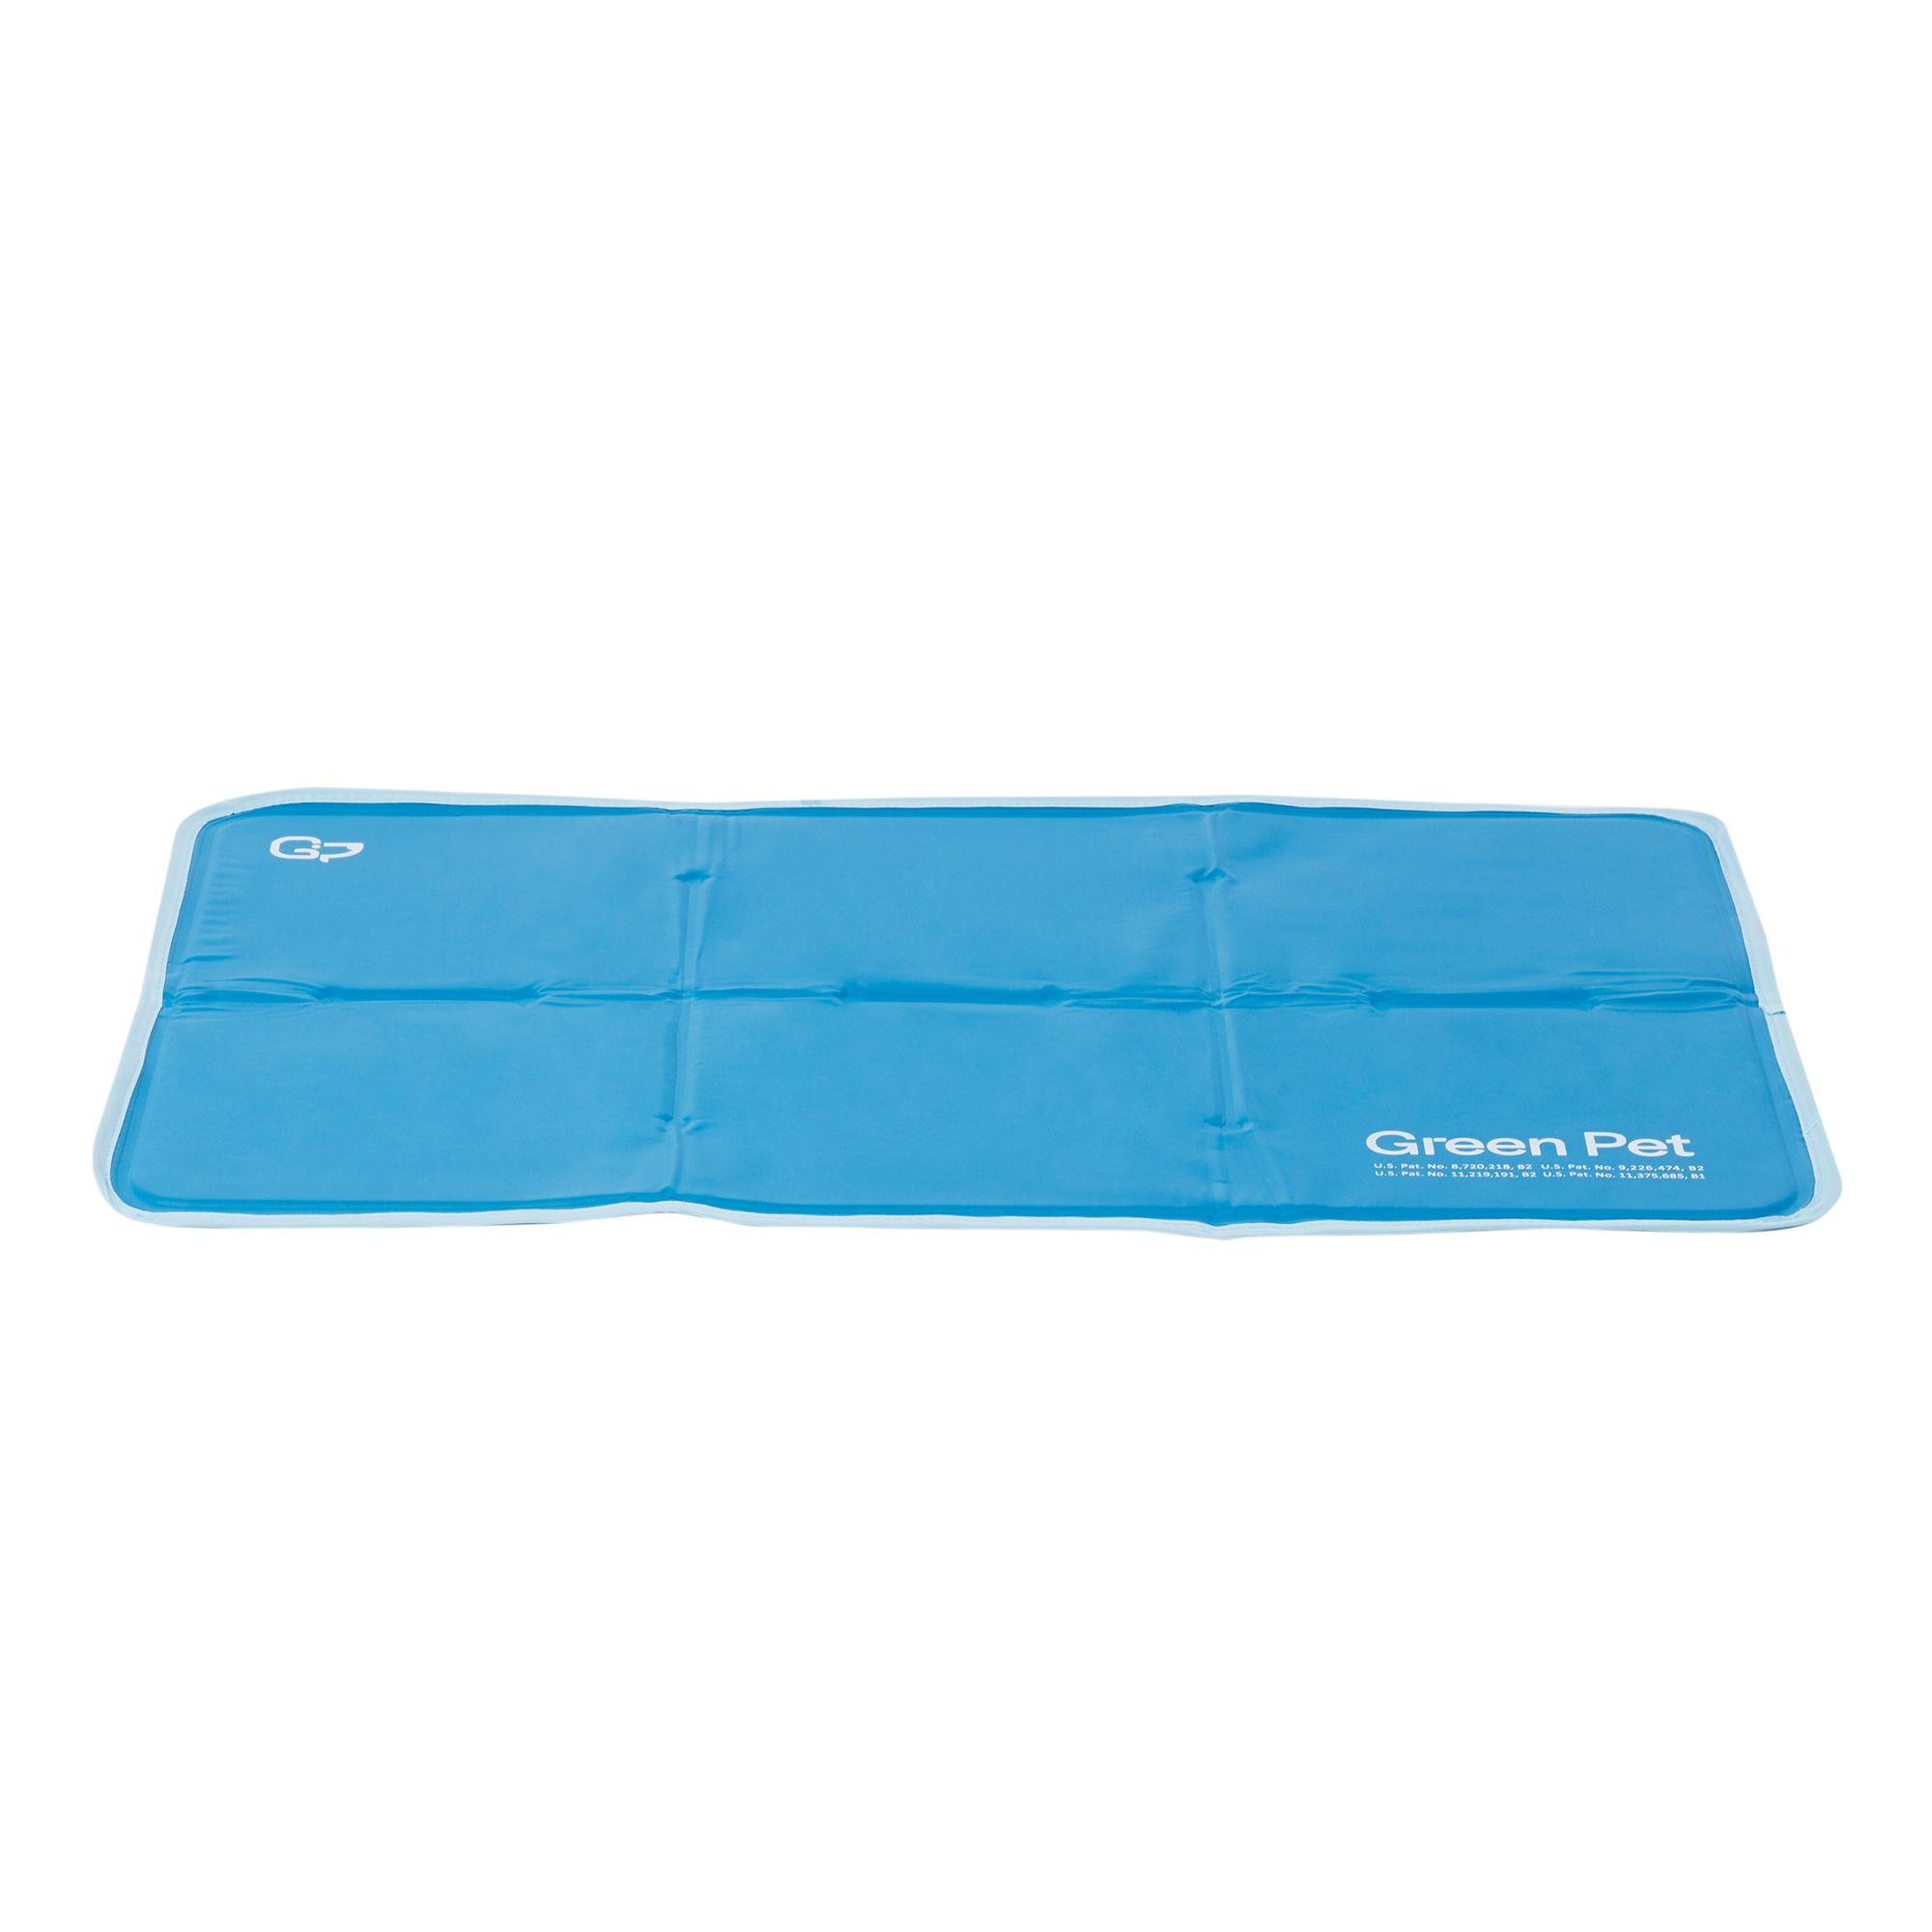 Thegreenpetshop Cool Pet Pad Size 20l X 30w Blue